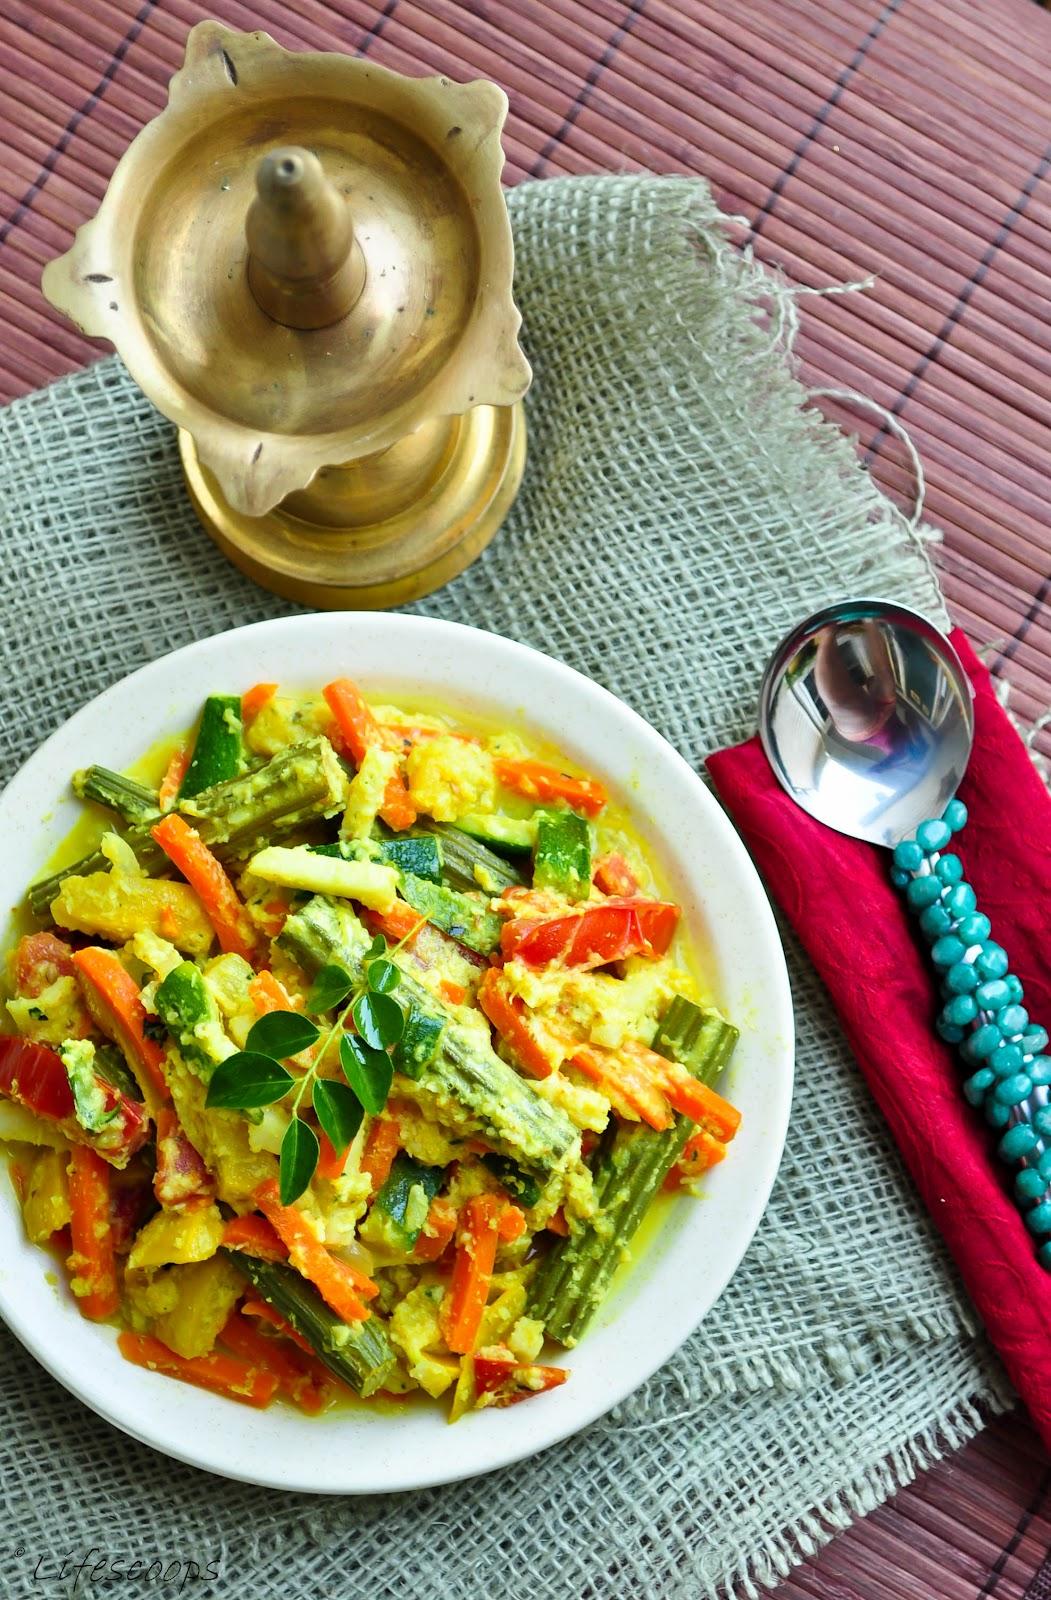 Life scoops kerala style avial mixed vegetables in coconut and kerala style avial mixed vegetables in coconut and yogurt sauce forumfinder Gallery